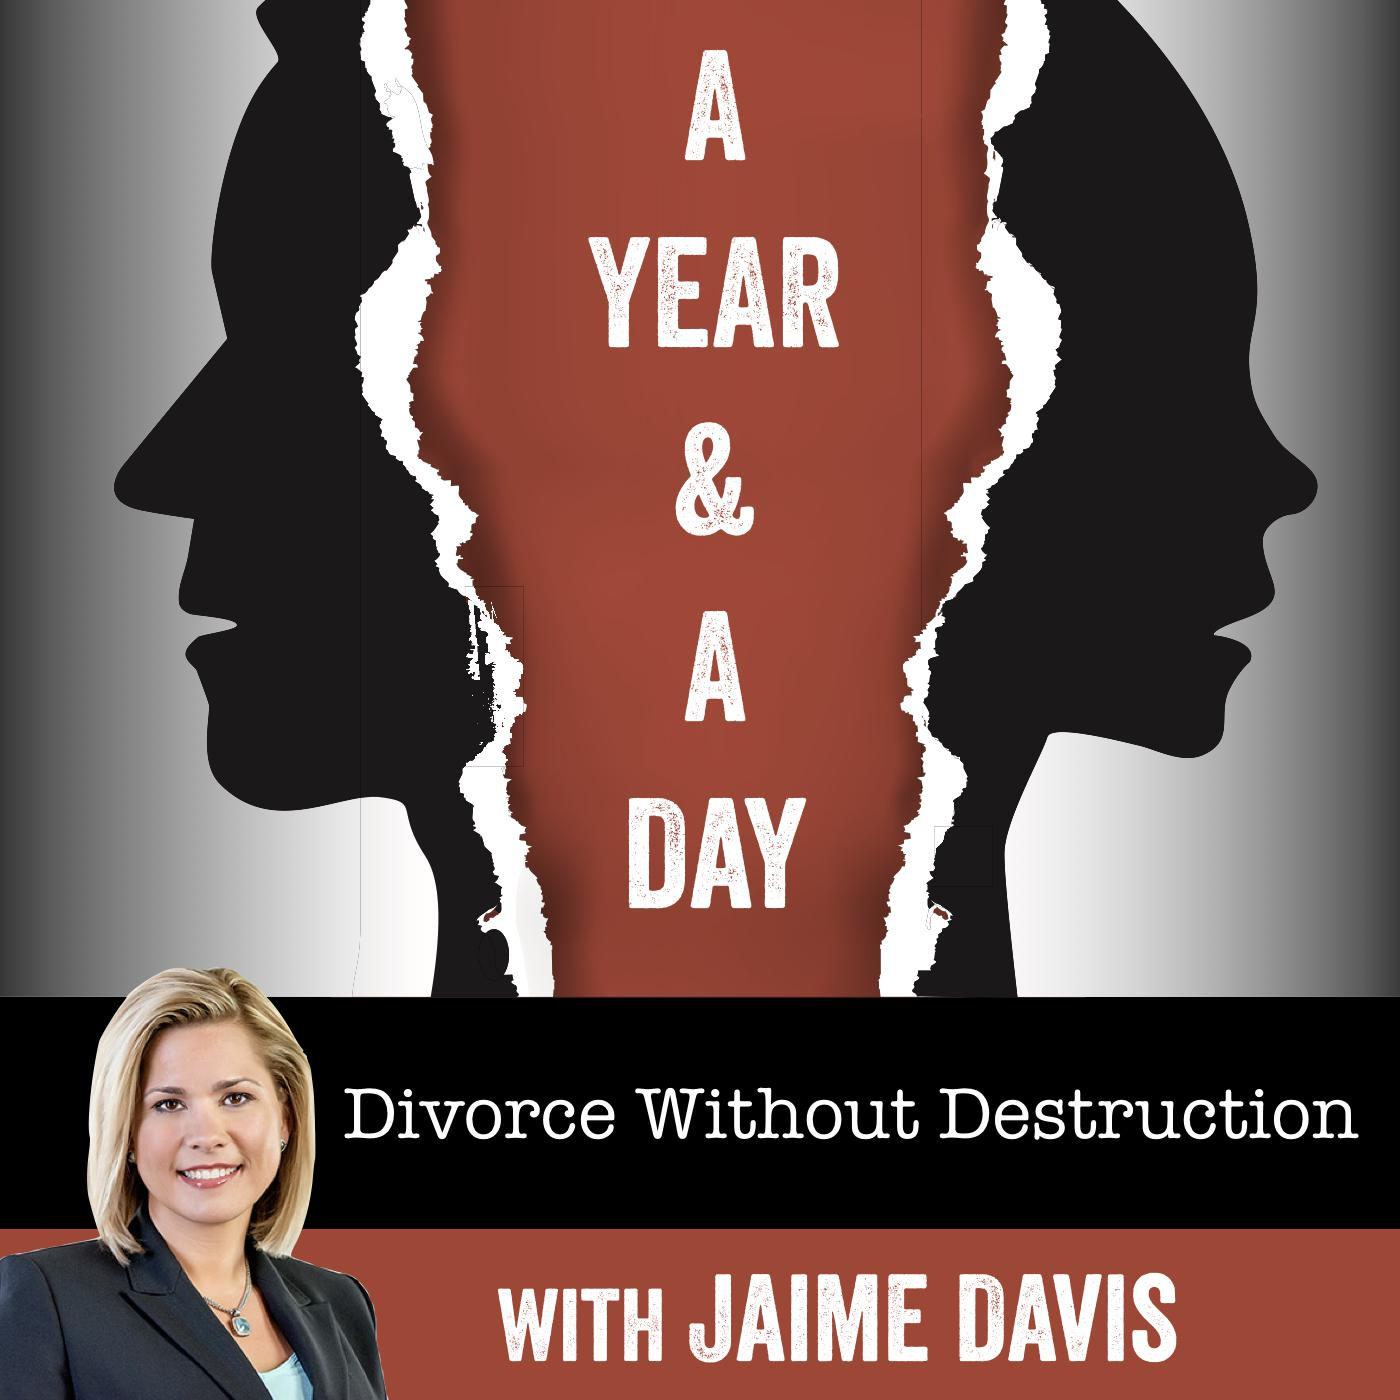 divorce season 3 episode 1